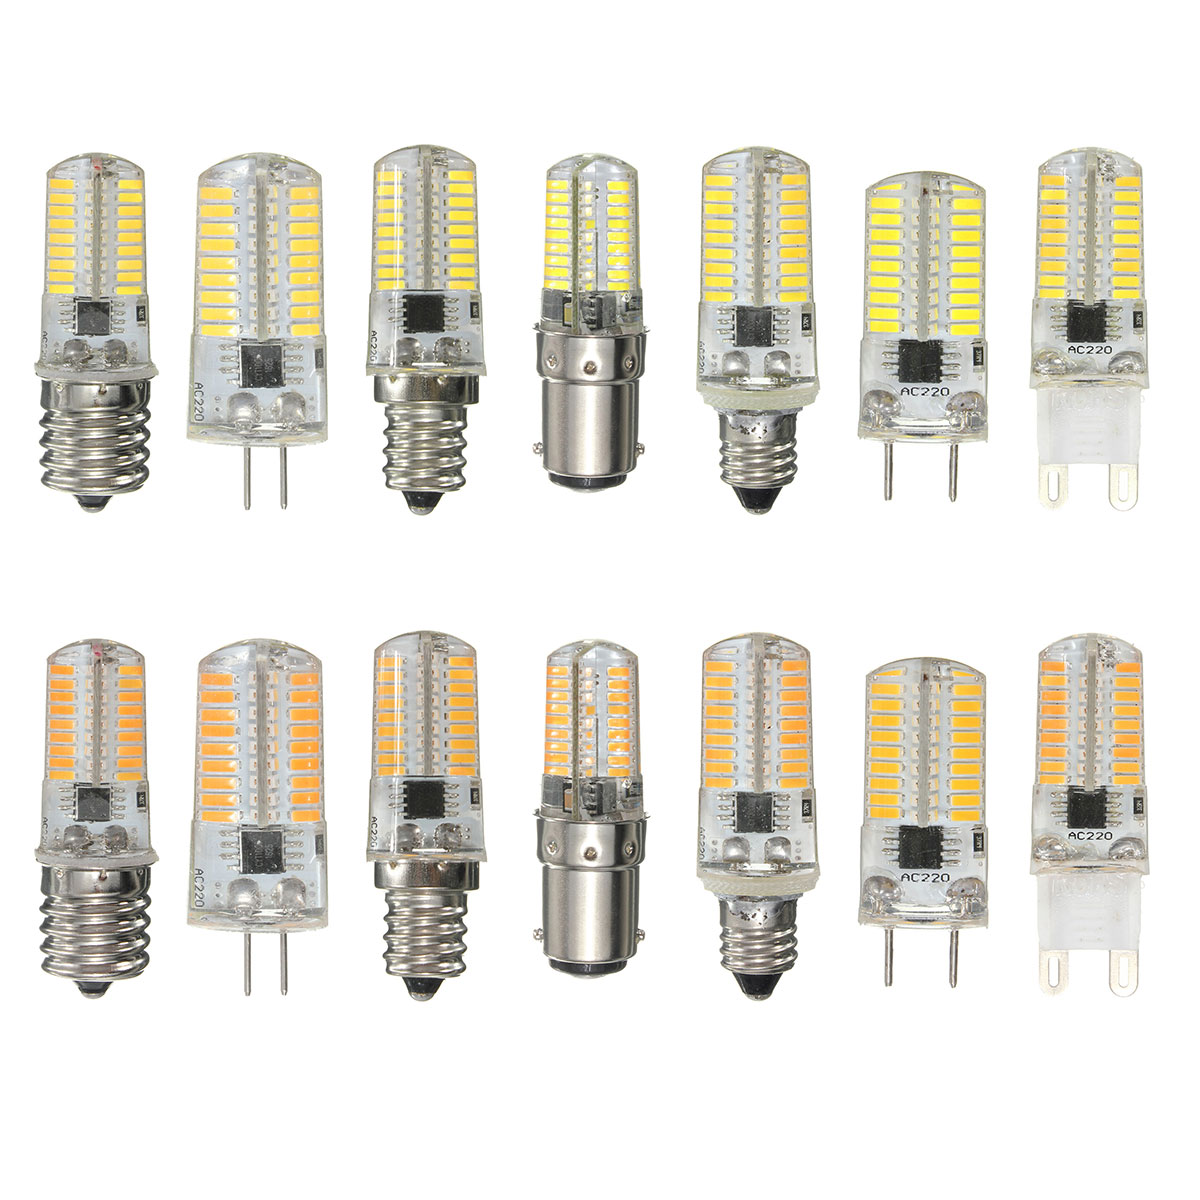 Dimmable LED Bulb BA15D G4 E11 3W 72 SMD 4014 LED Warm White White Silicone Corn Bulb Light AC220V